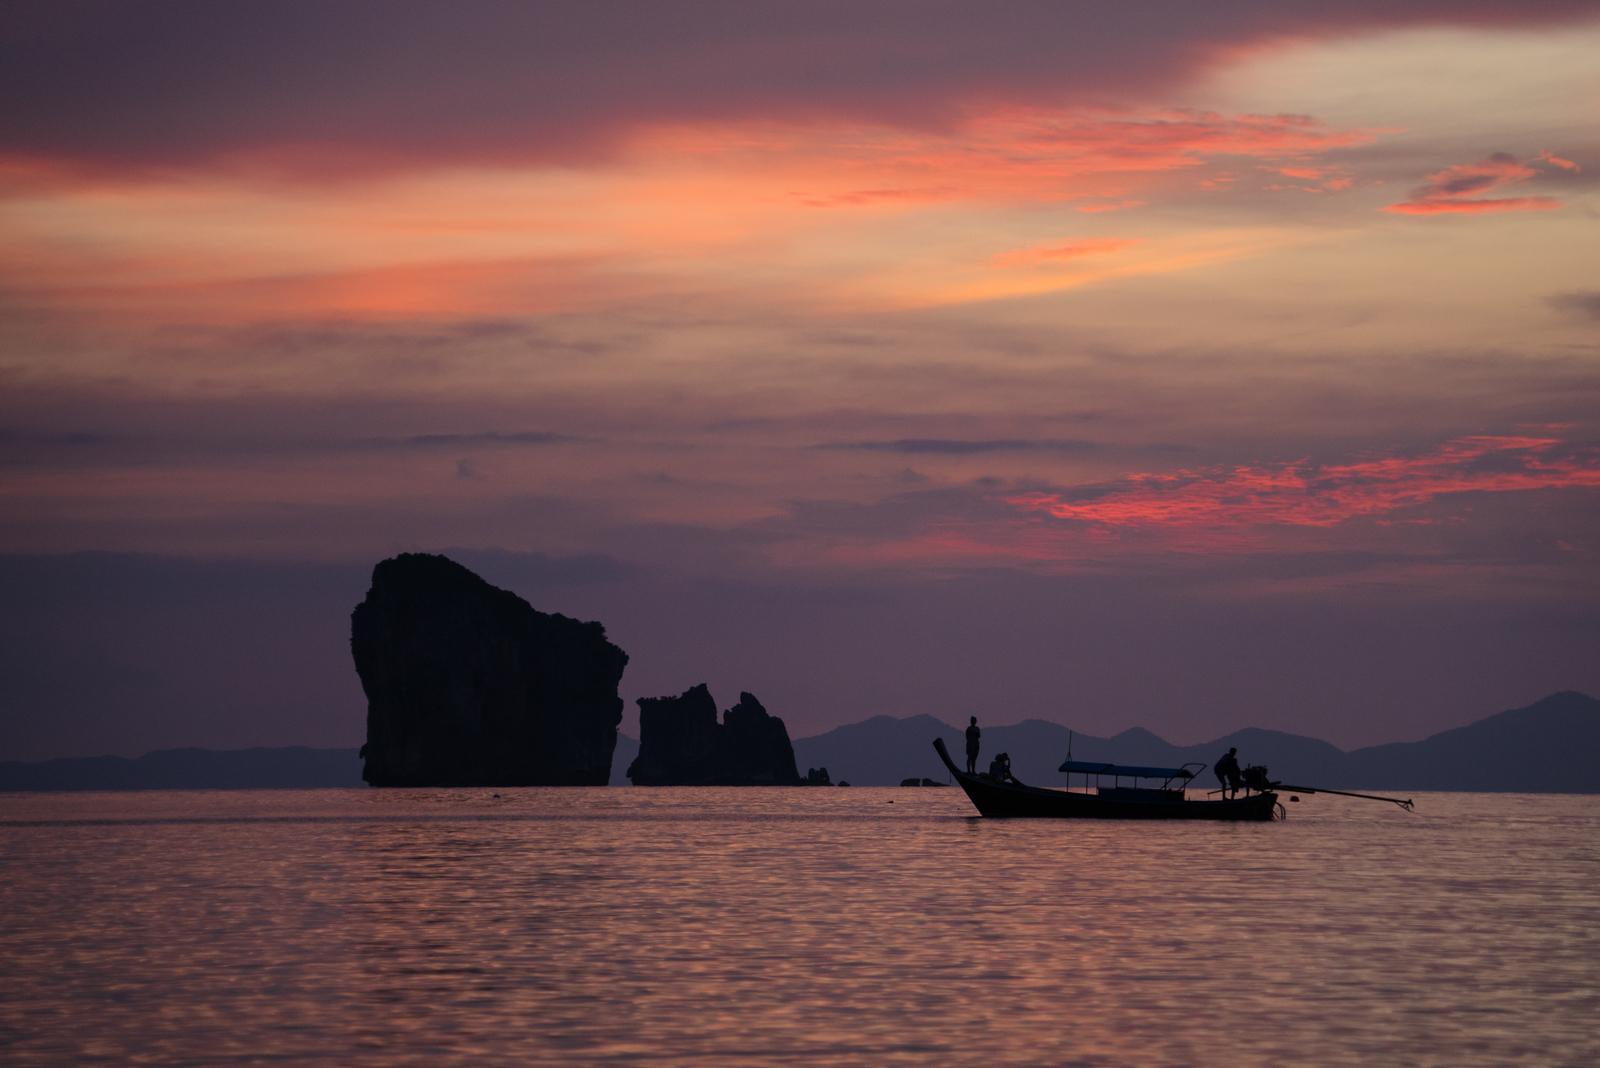 Krabi Sunset Purple Boat Standing